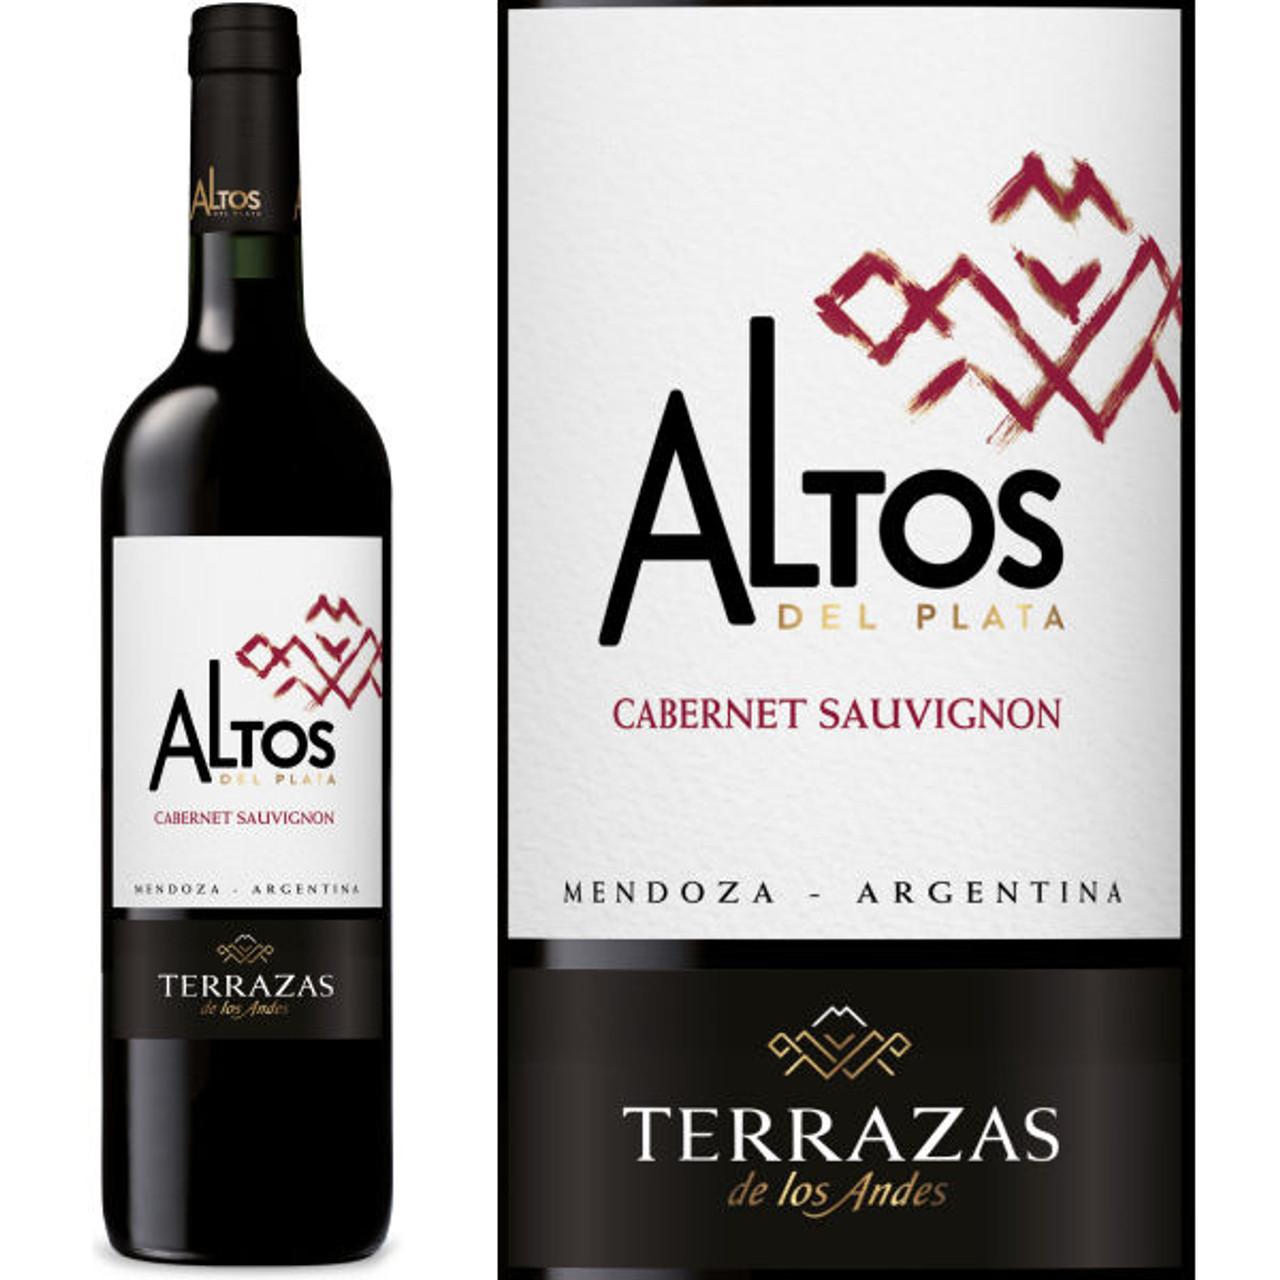 12 Bottle Case Terrazas De Los Andes Altos Del Plata Cabernet 2016 W Free Shipping